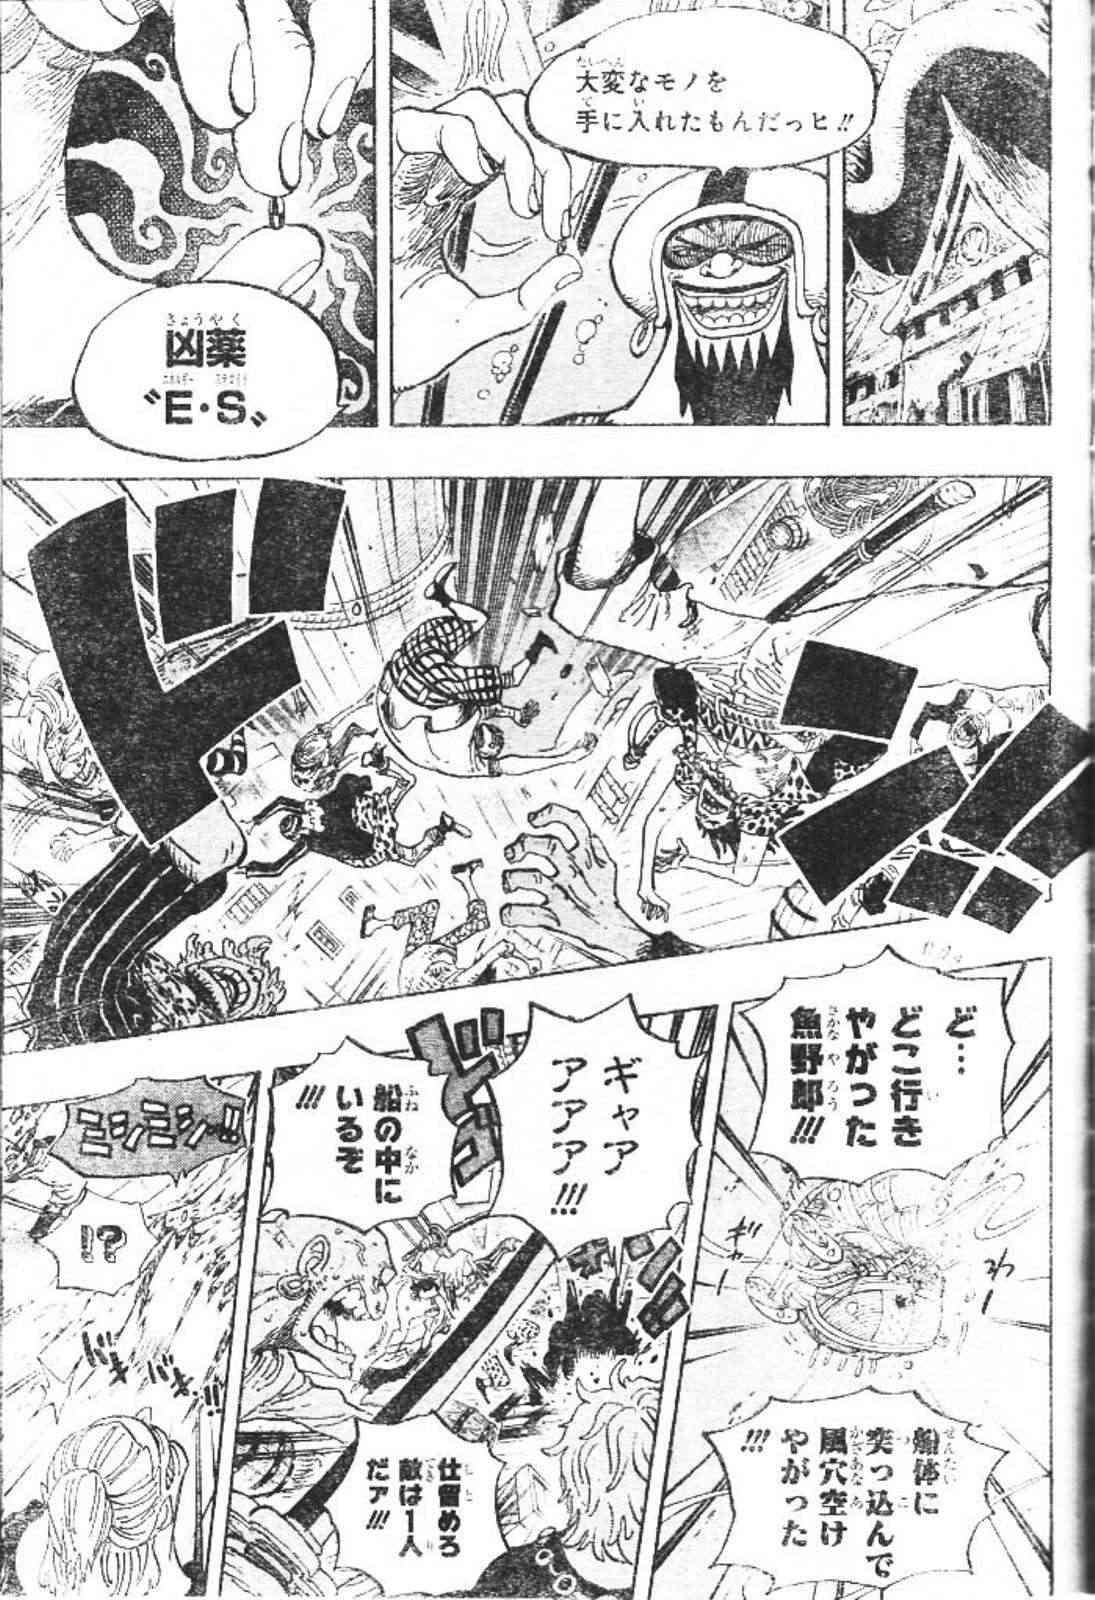 One Piece Manga 611 Spoiler Pics 13_raw10